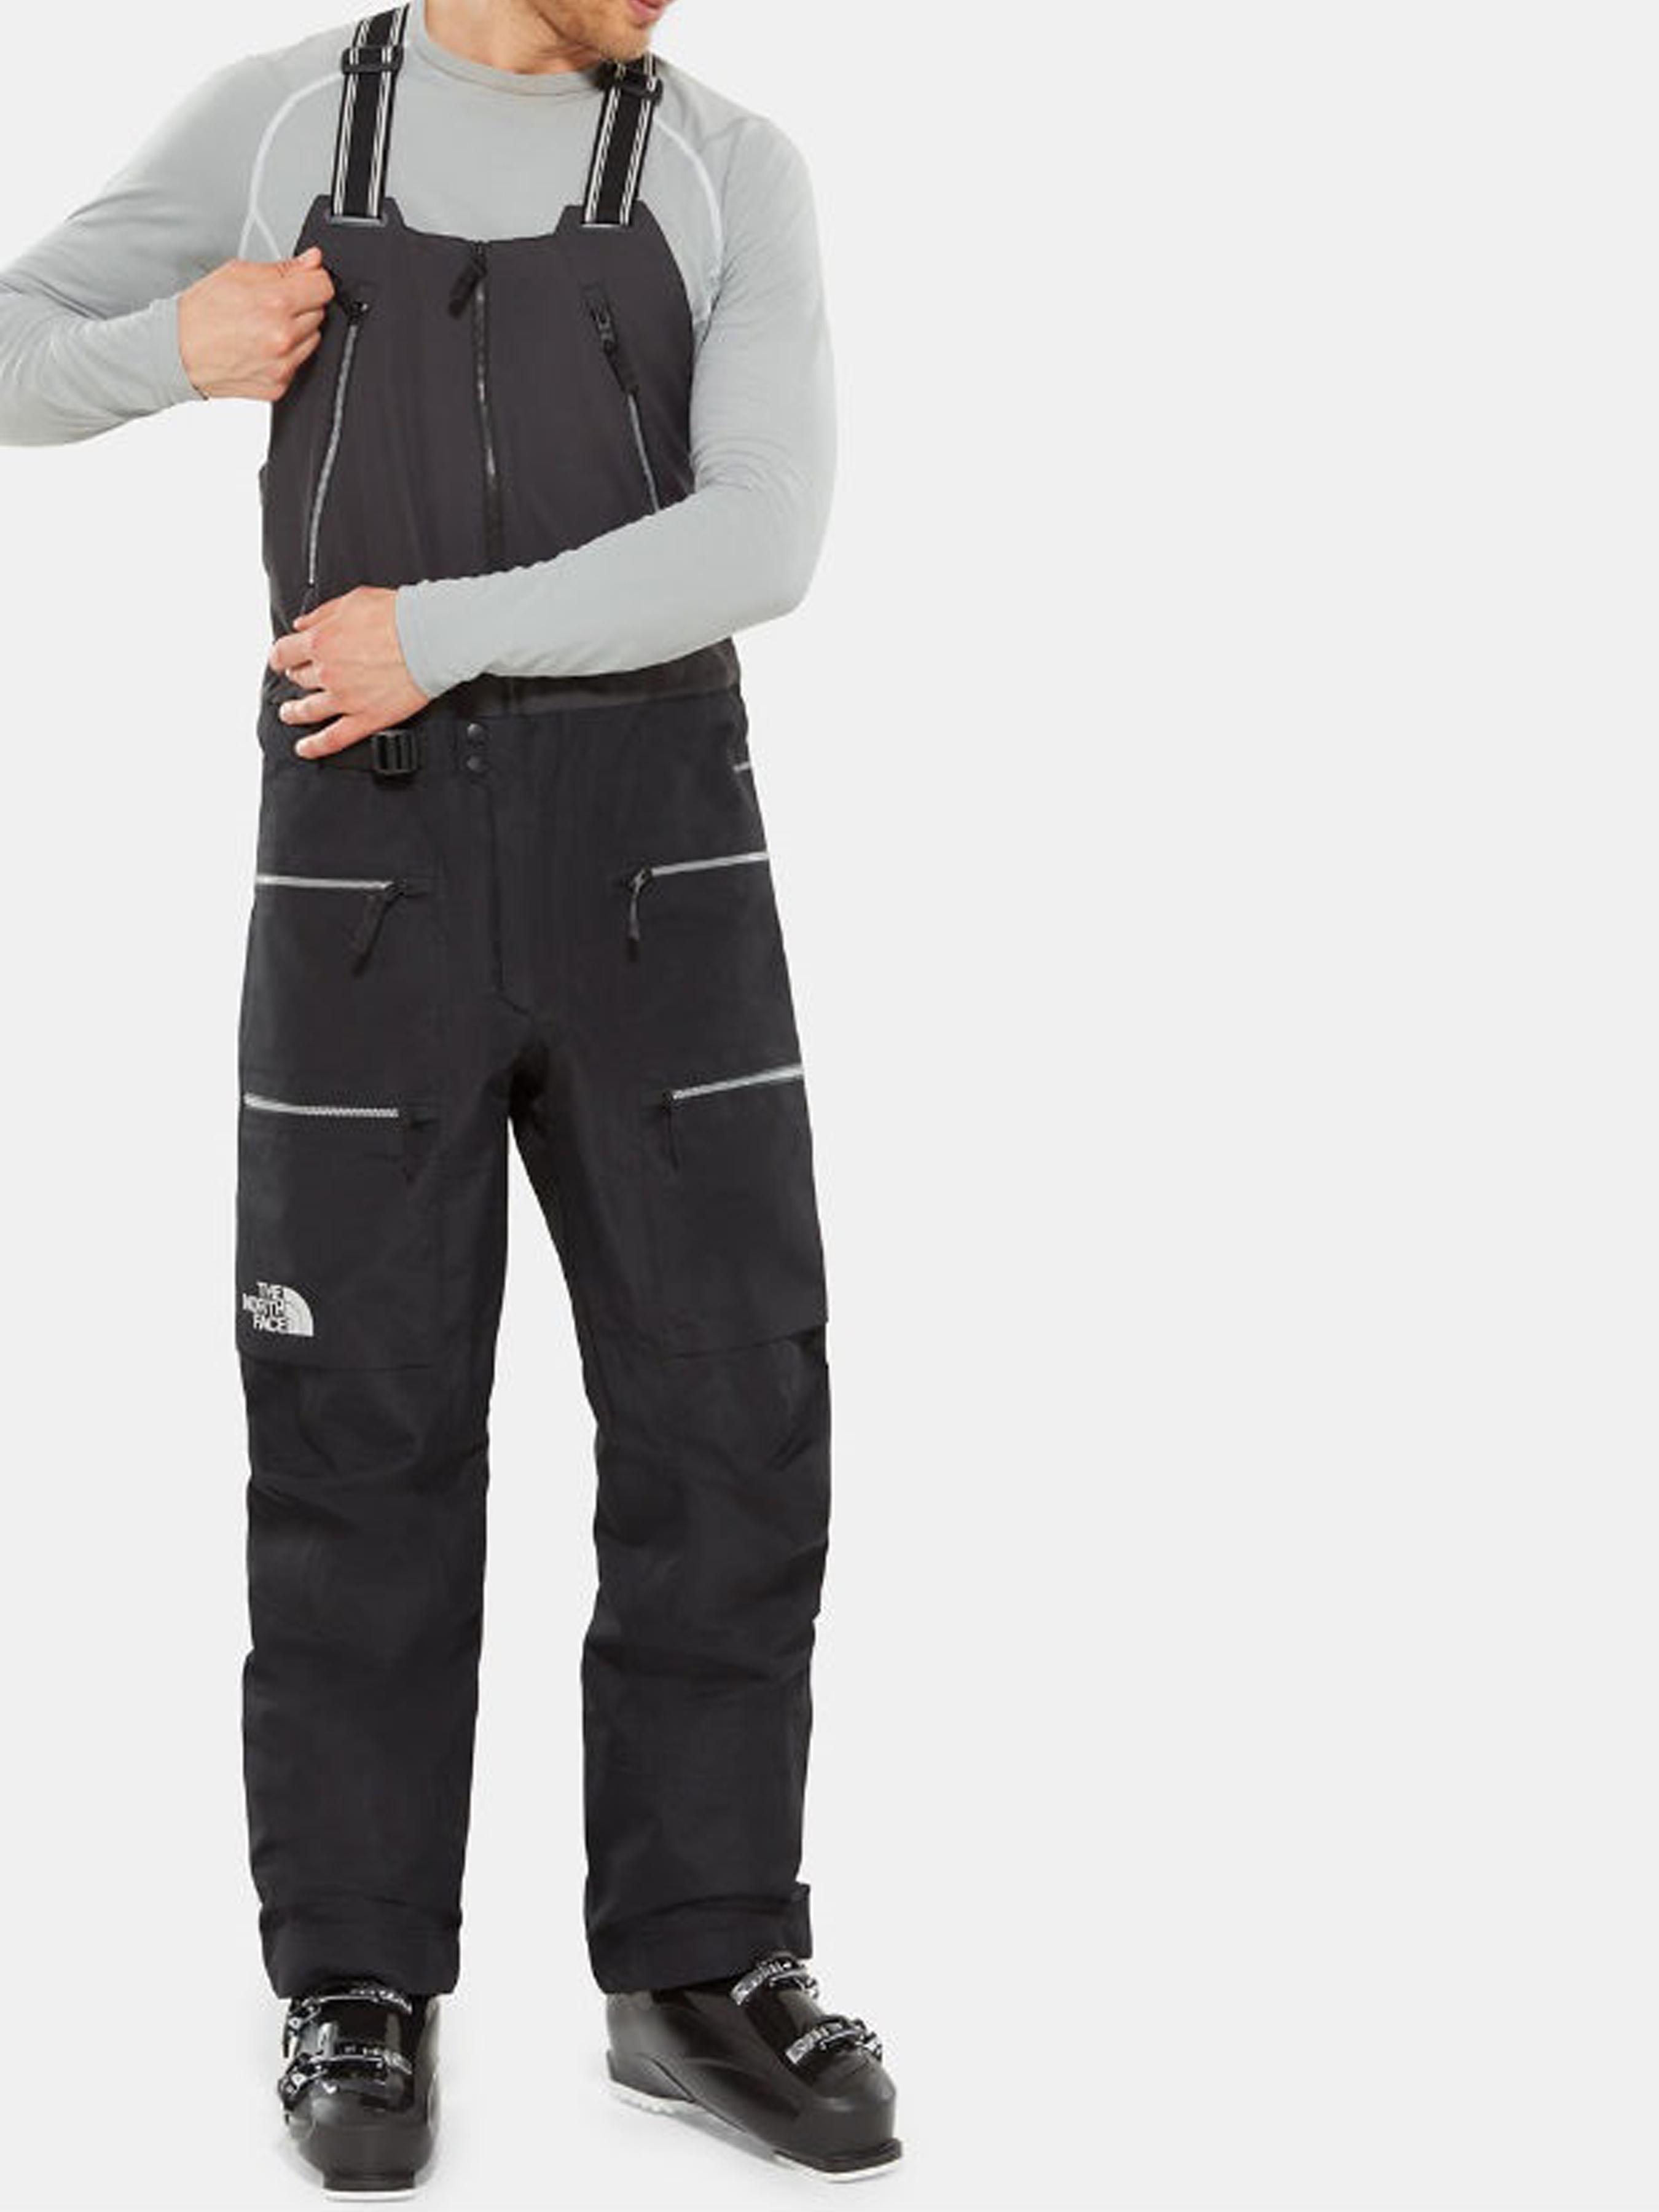 Штаны лыжные мужские The North Face модель N290 , 2017